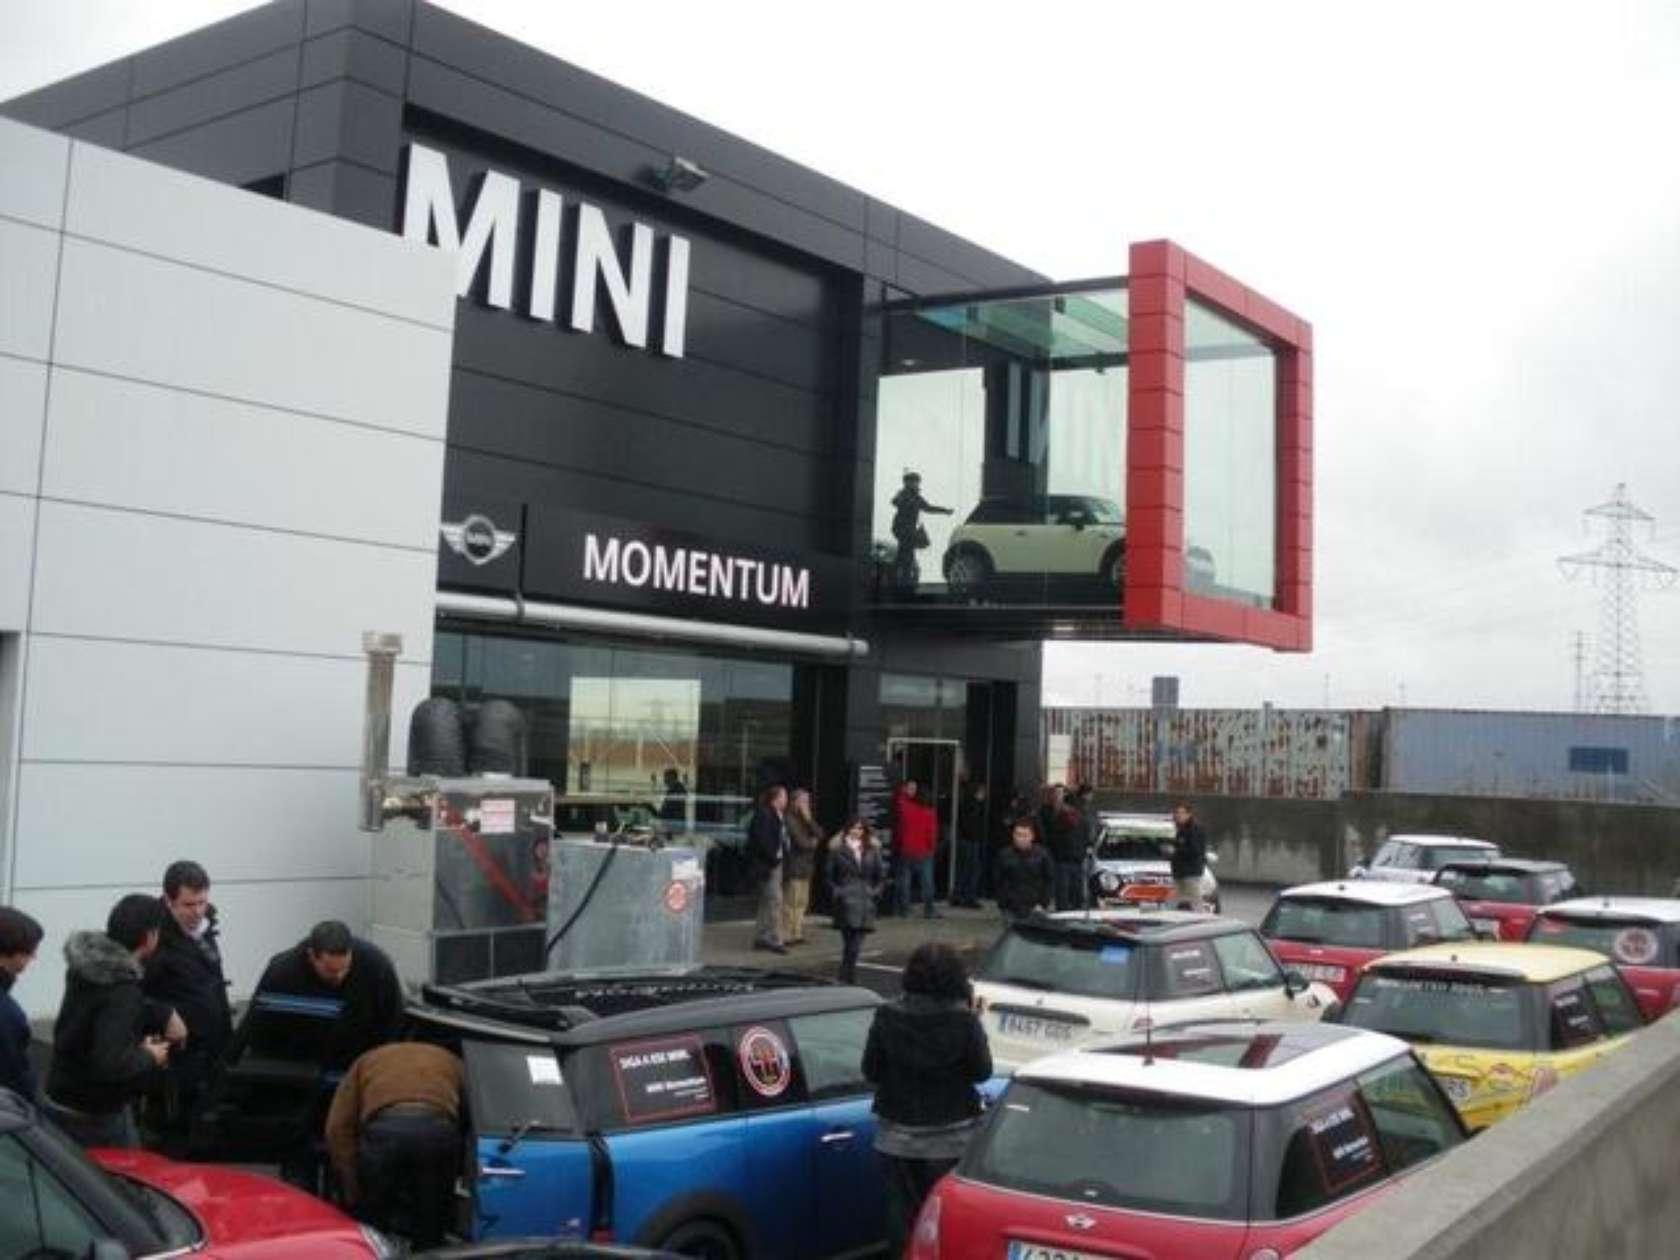 container store garage ideas - Momemtum BMW Mini Showroom Leganés Architizer